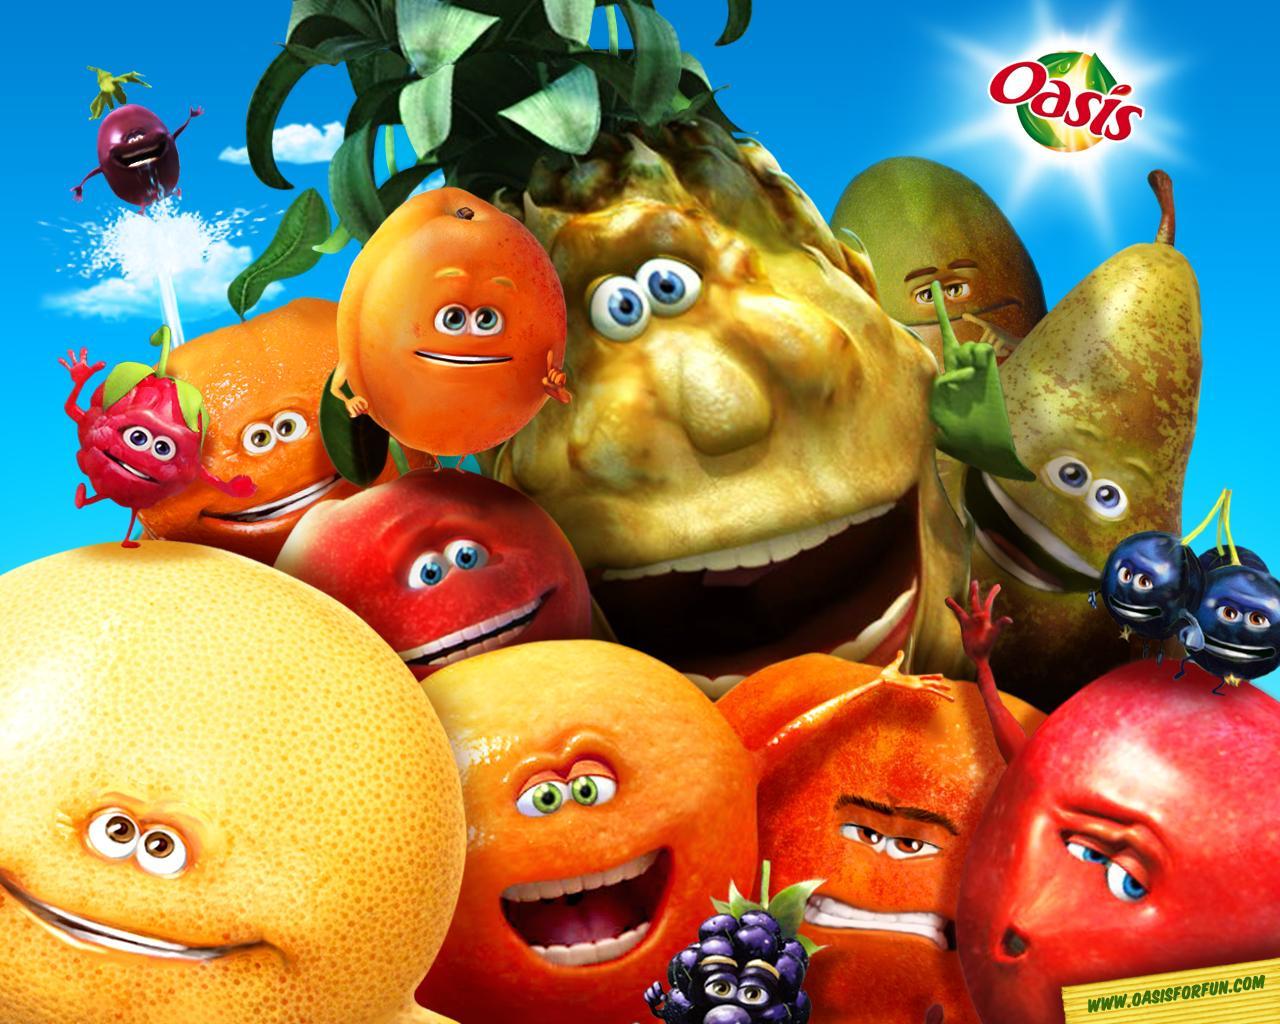 Oasis mascottes